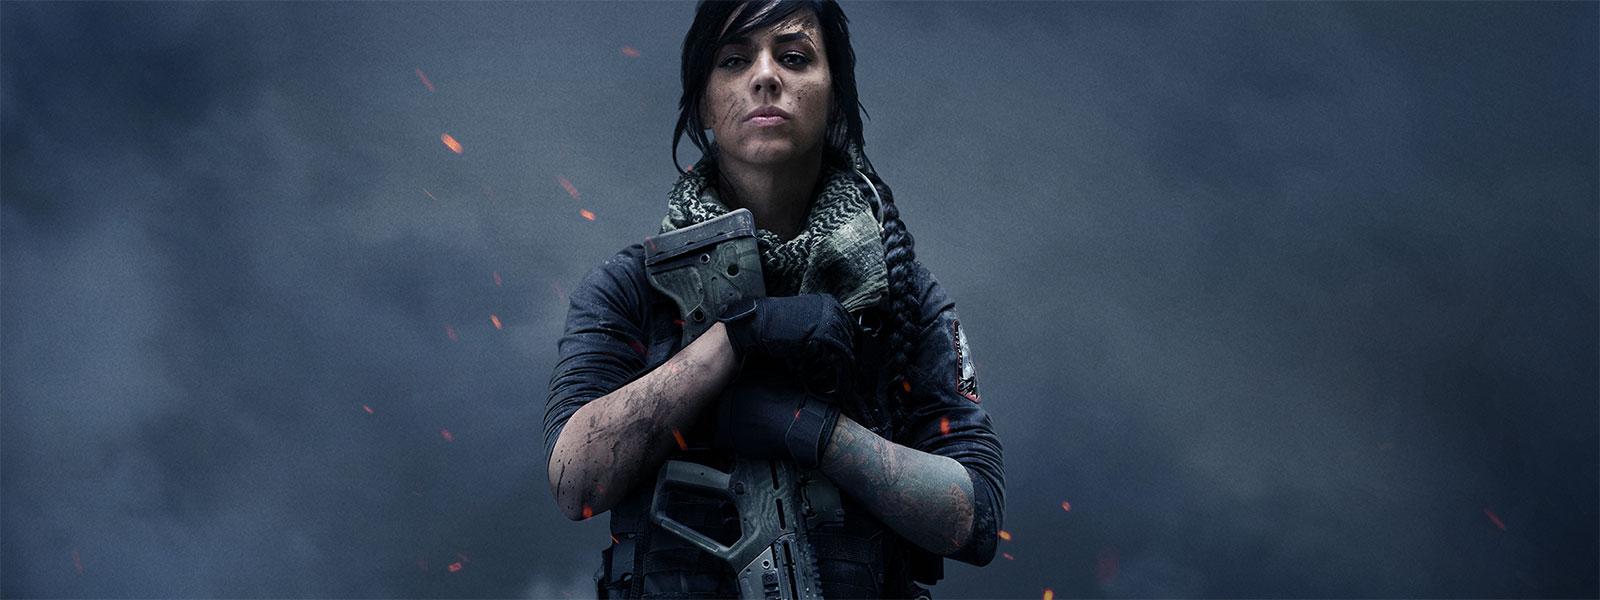 Female character holding a gun